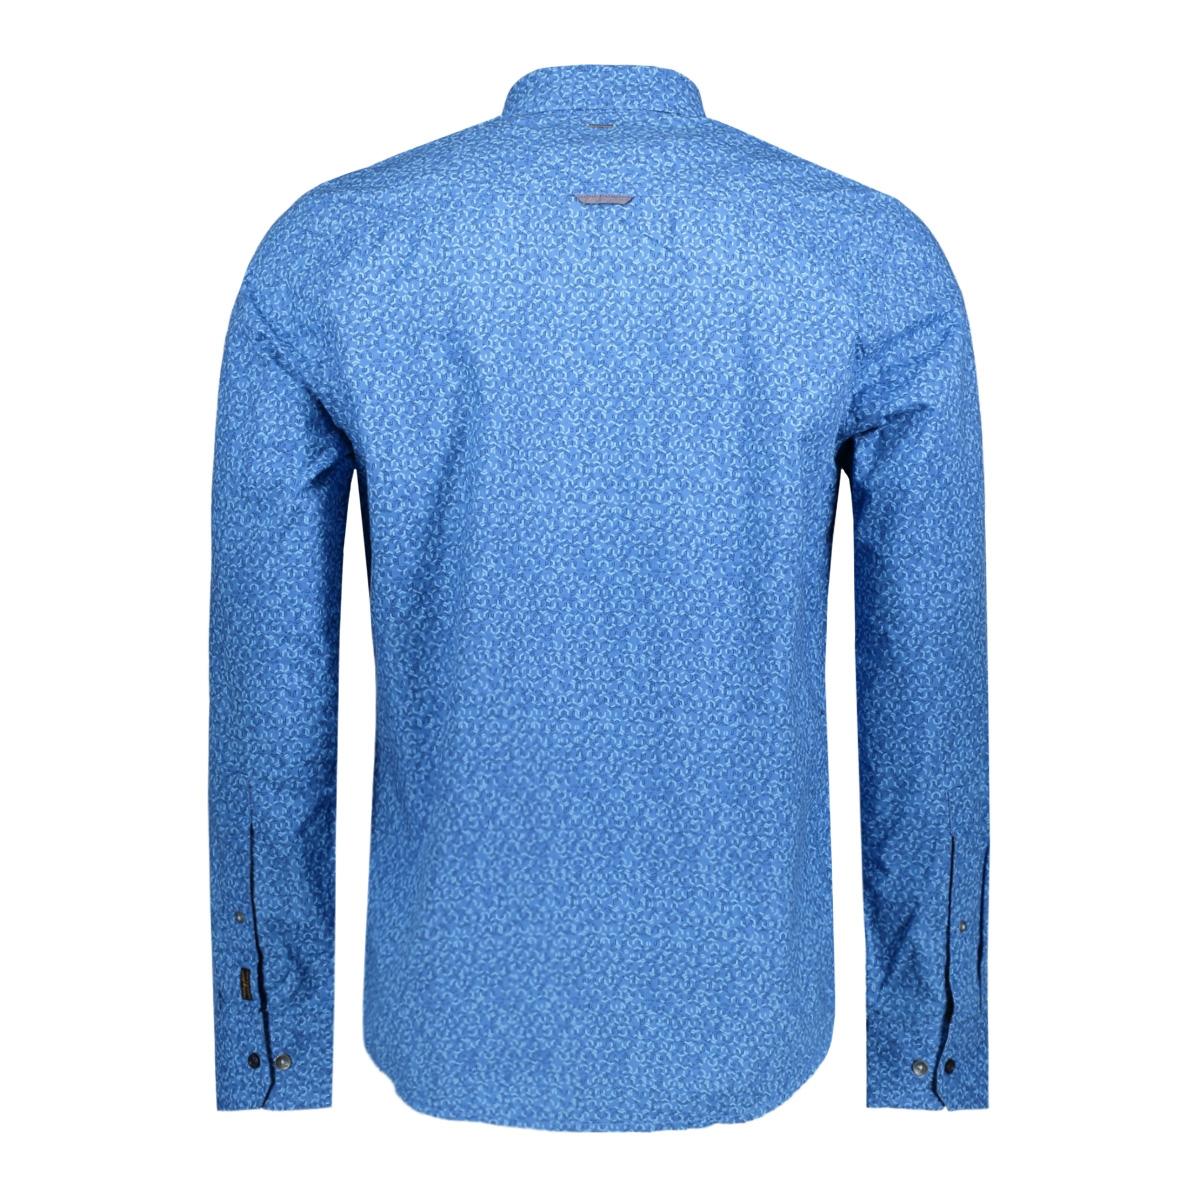 psi178201 pme legend overhemd 5307